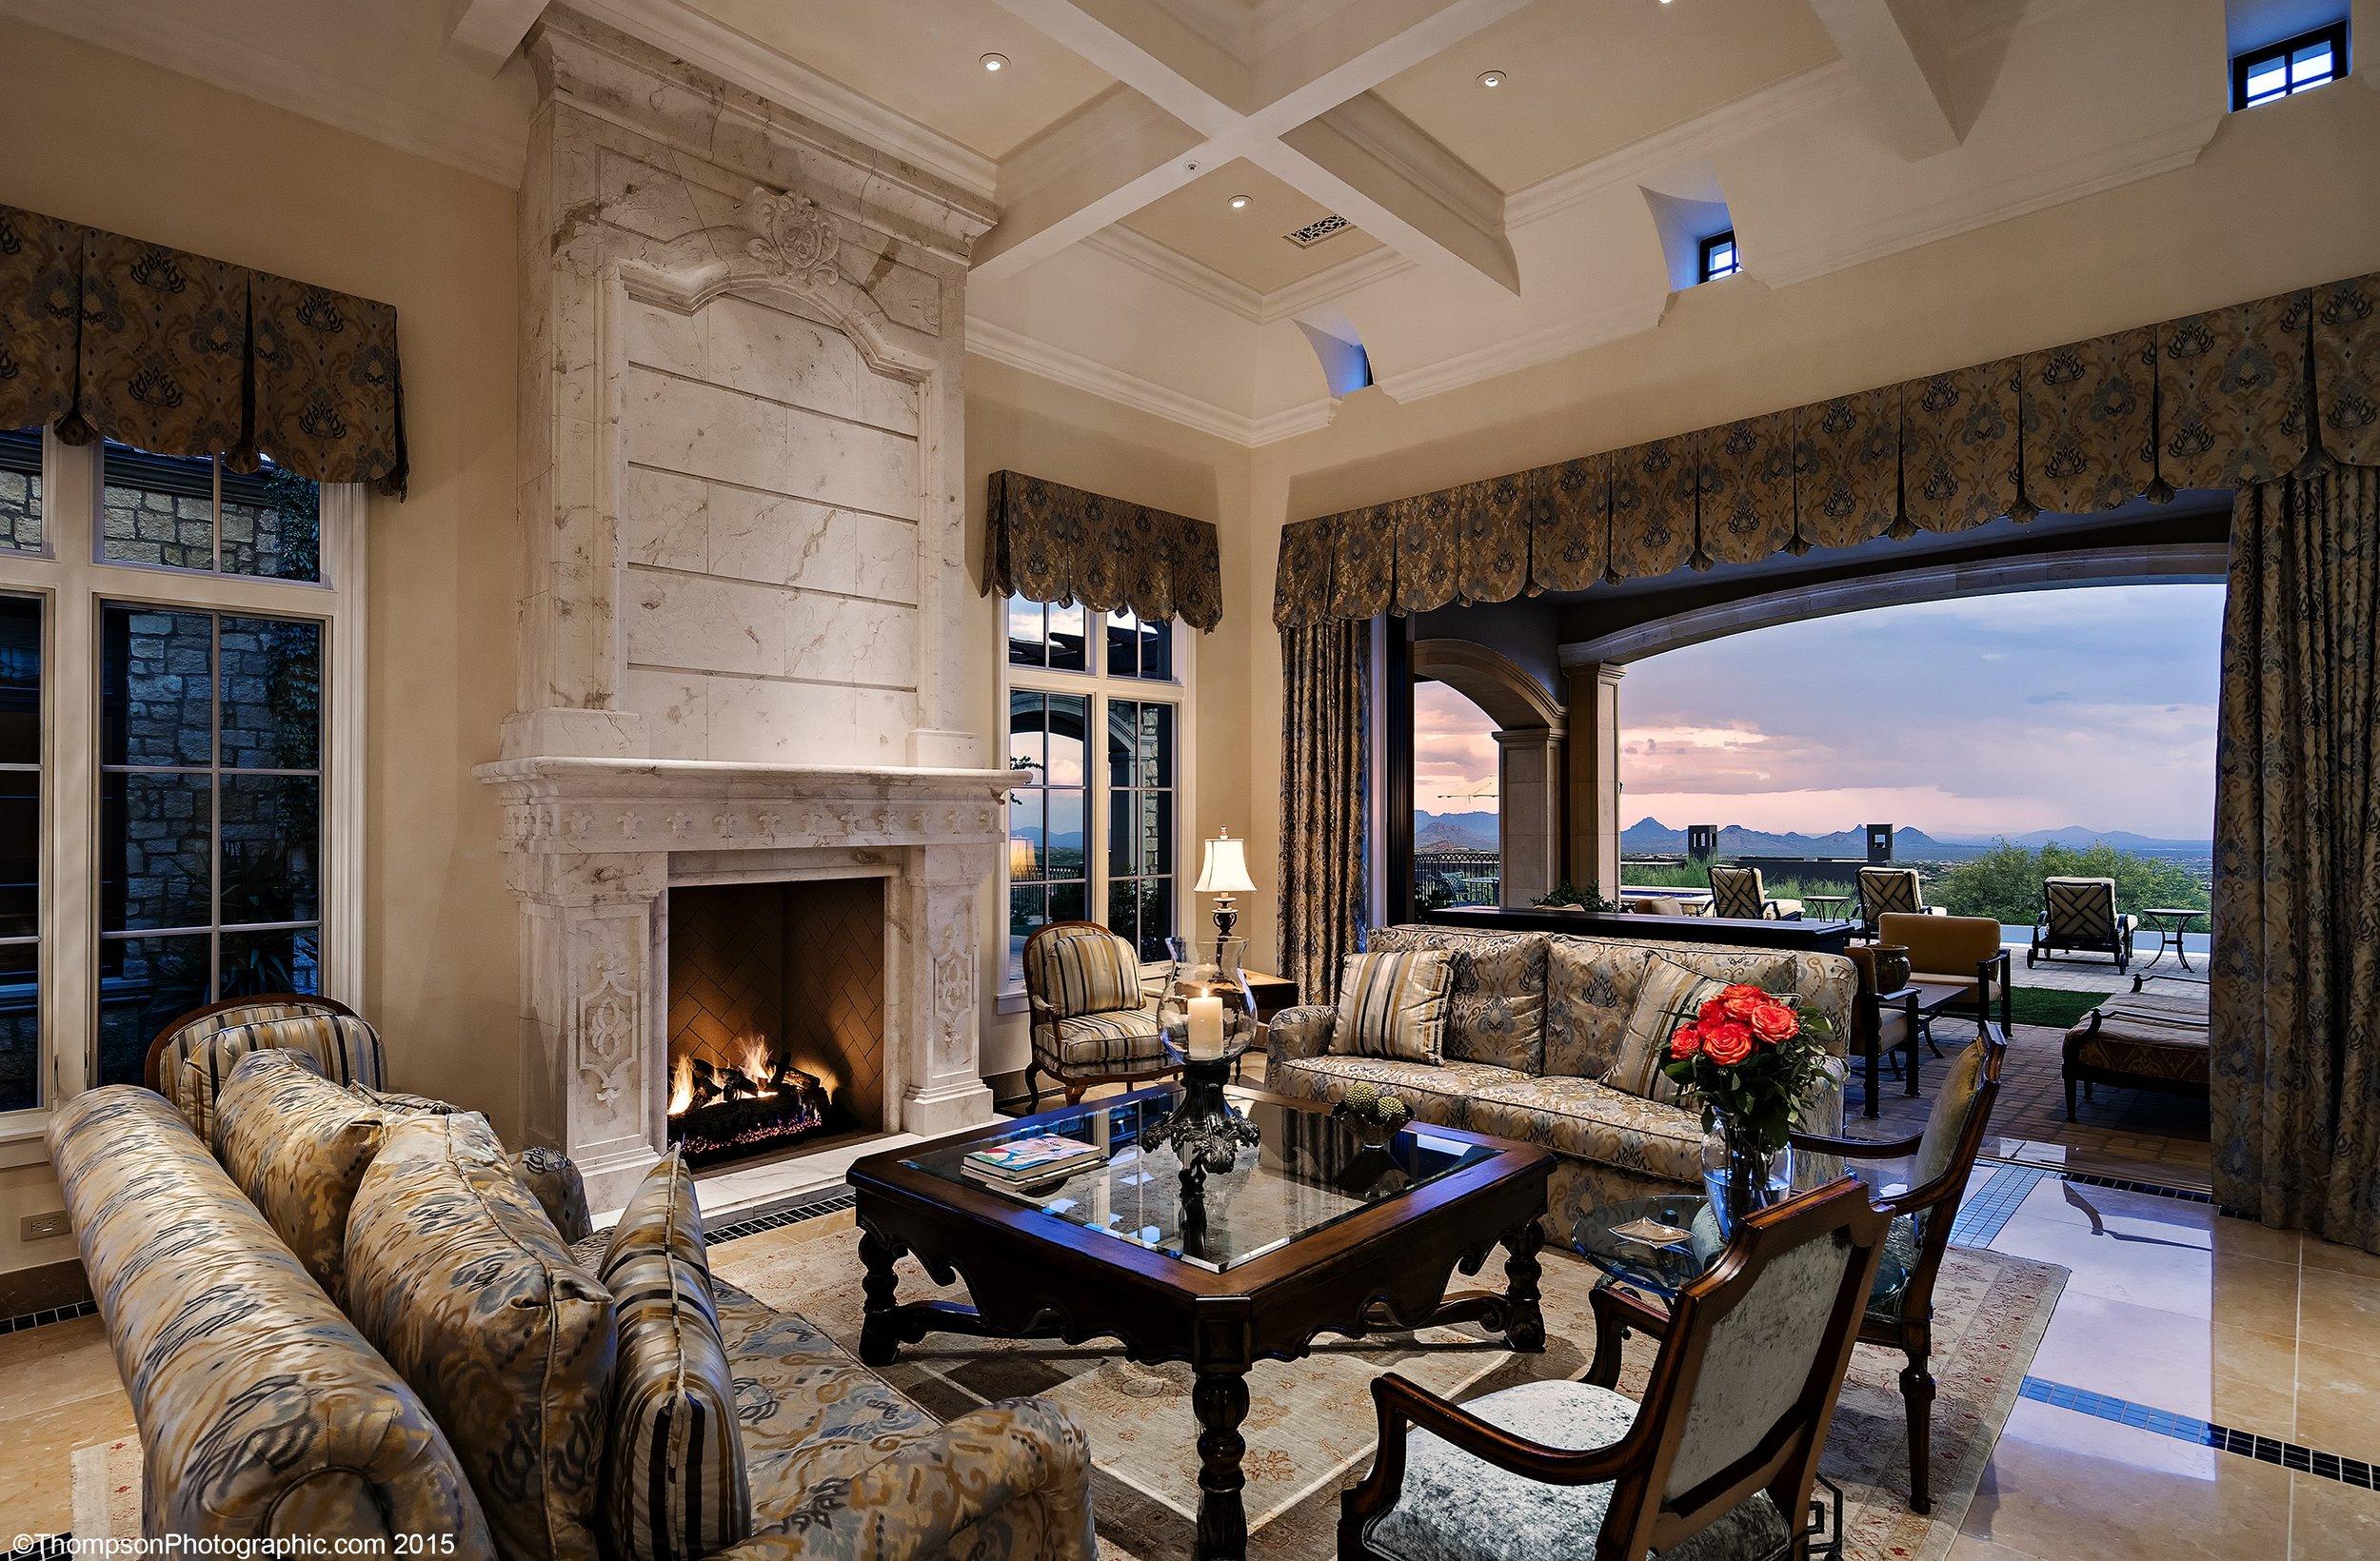 065_Living Room View.jpg